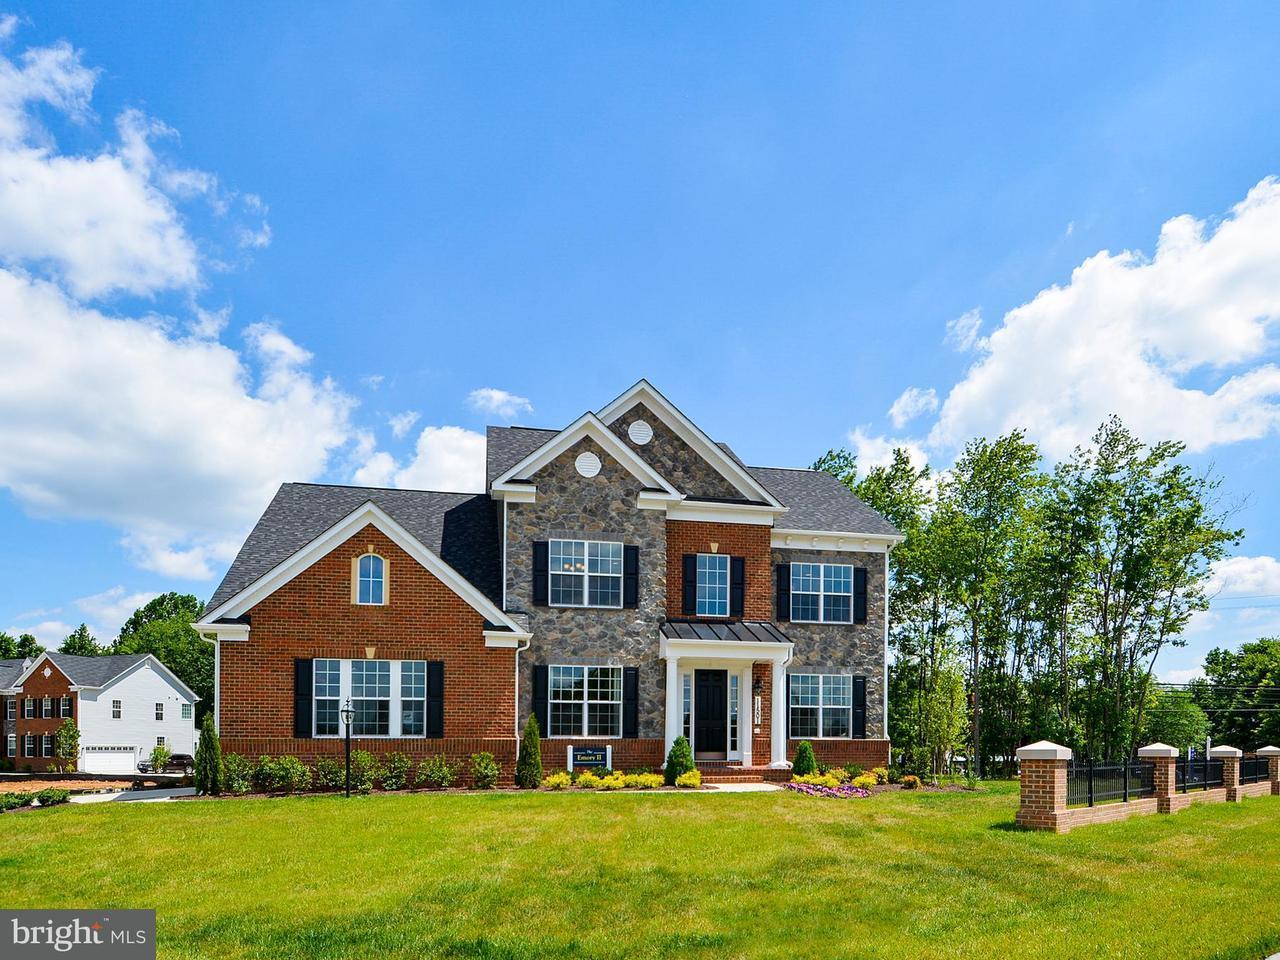 16711 maylon ct brandywine md mls 1004343287 better homes and gardens real estate. Black Bedroom Furniture Sets. Home Design Ideas